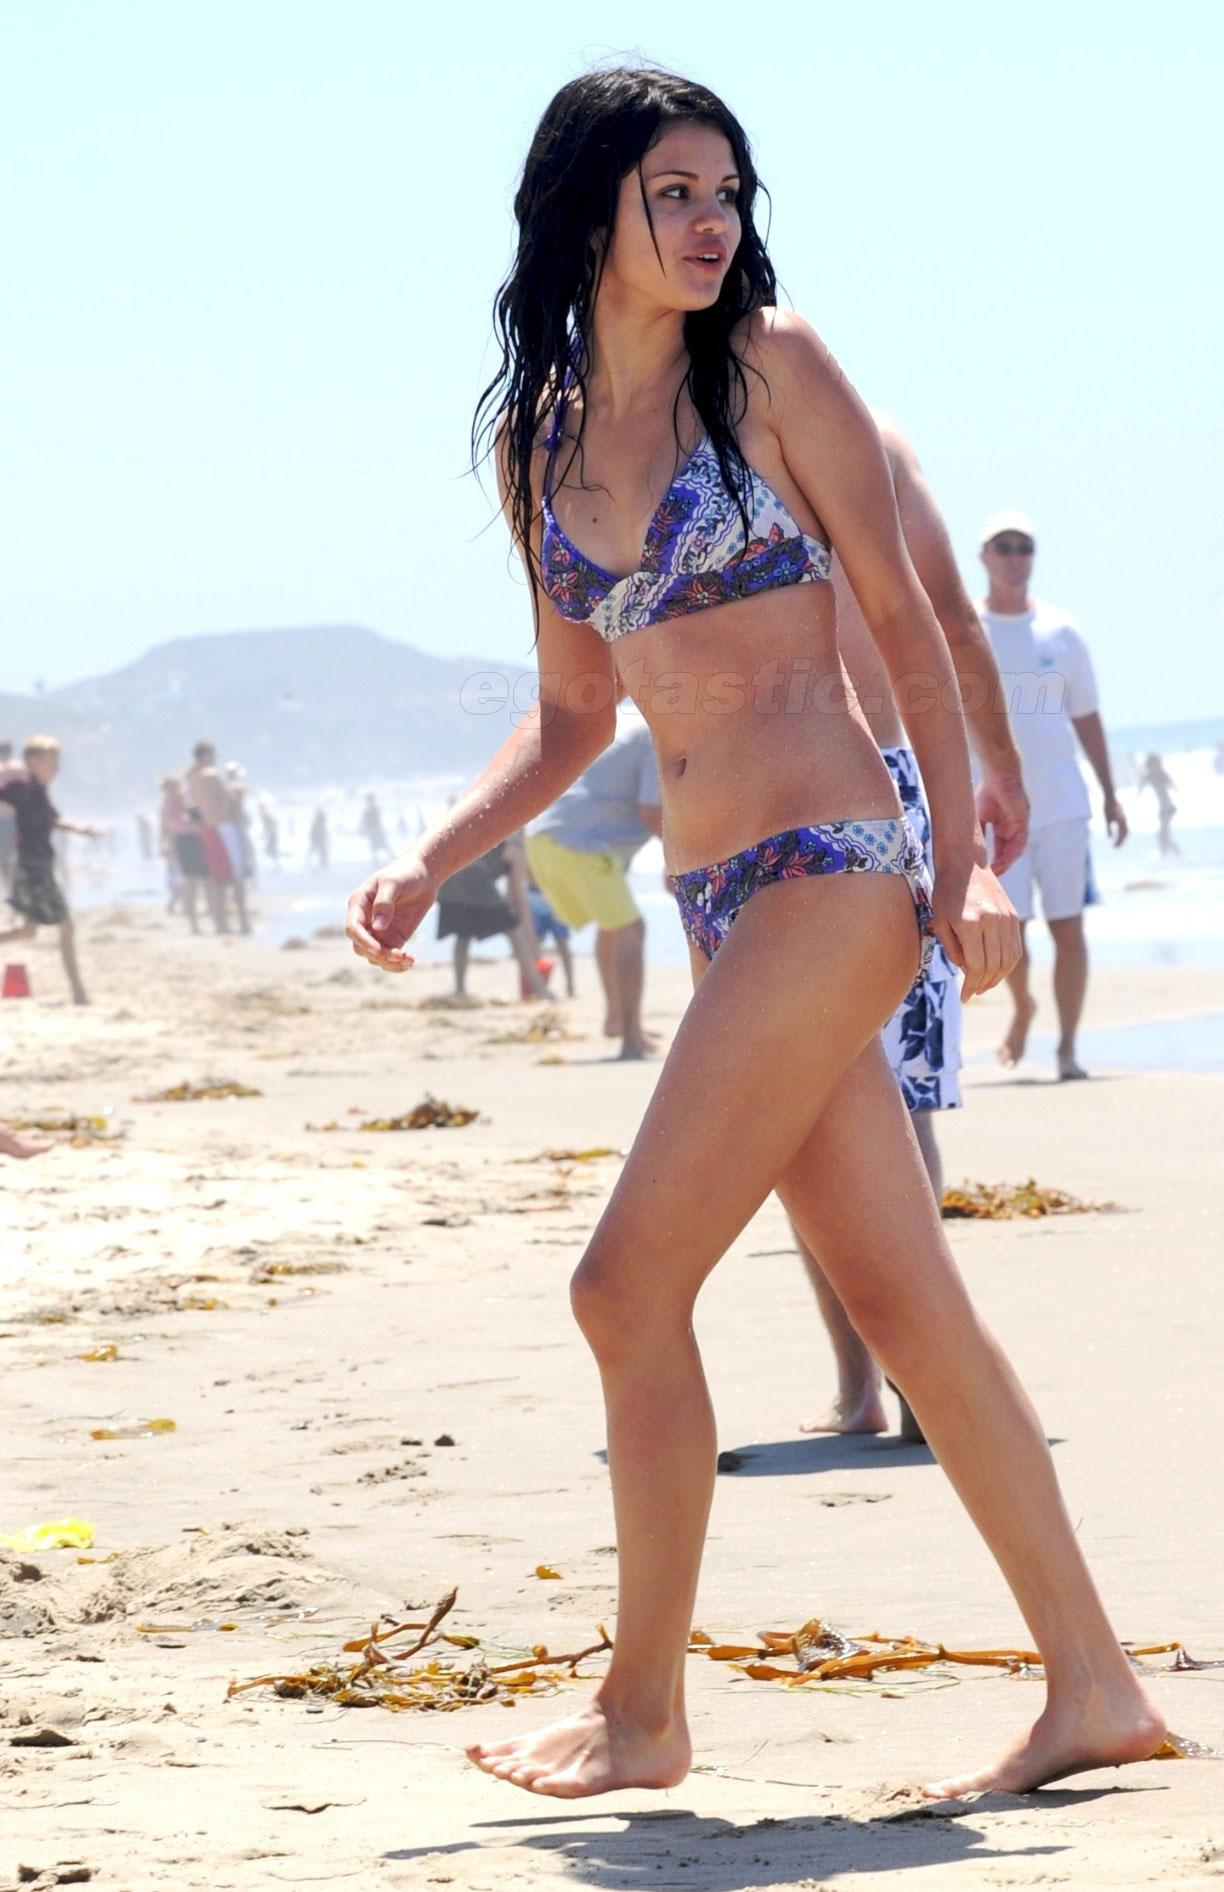 Para el bikini adolescente desnuda desnuda